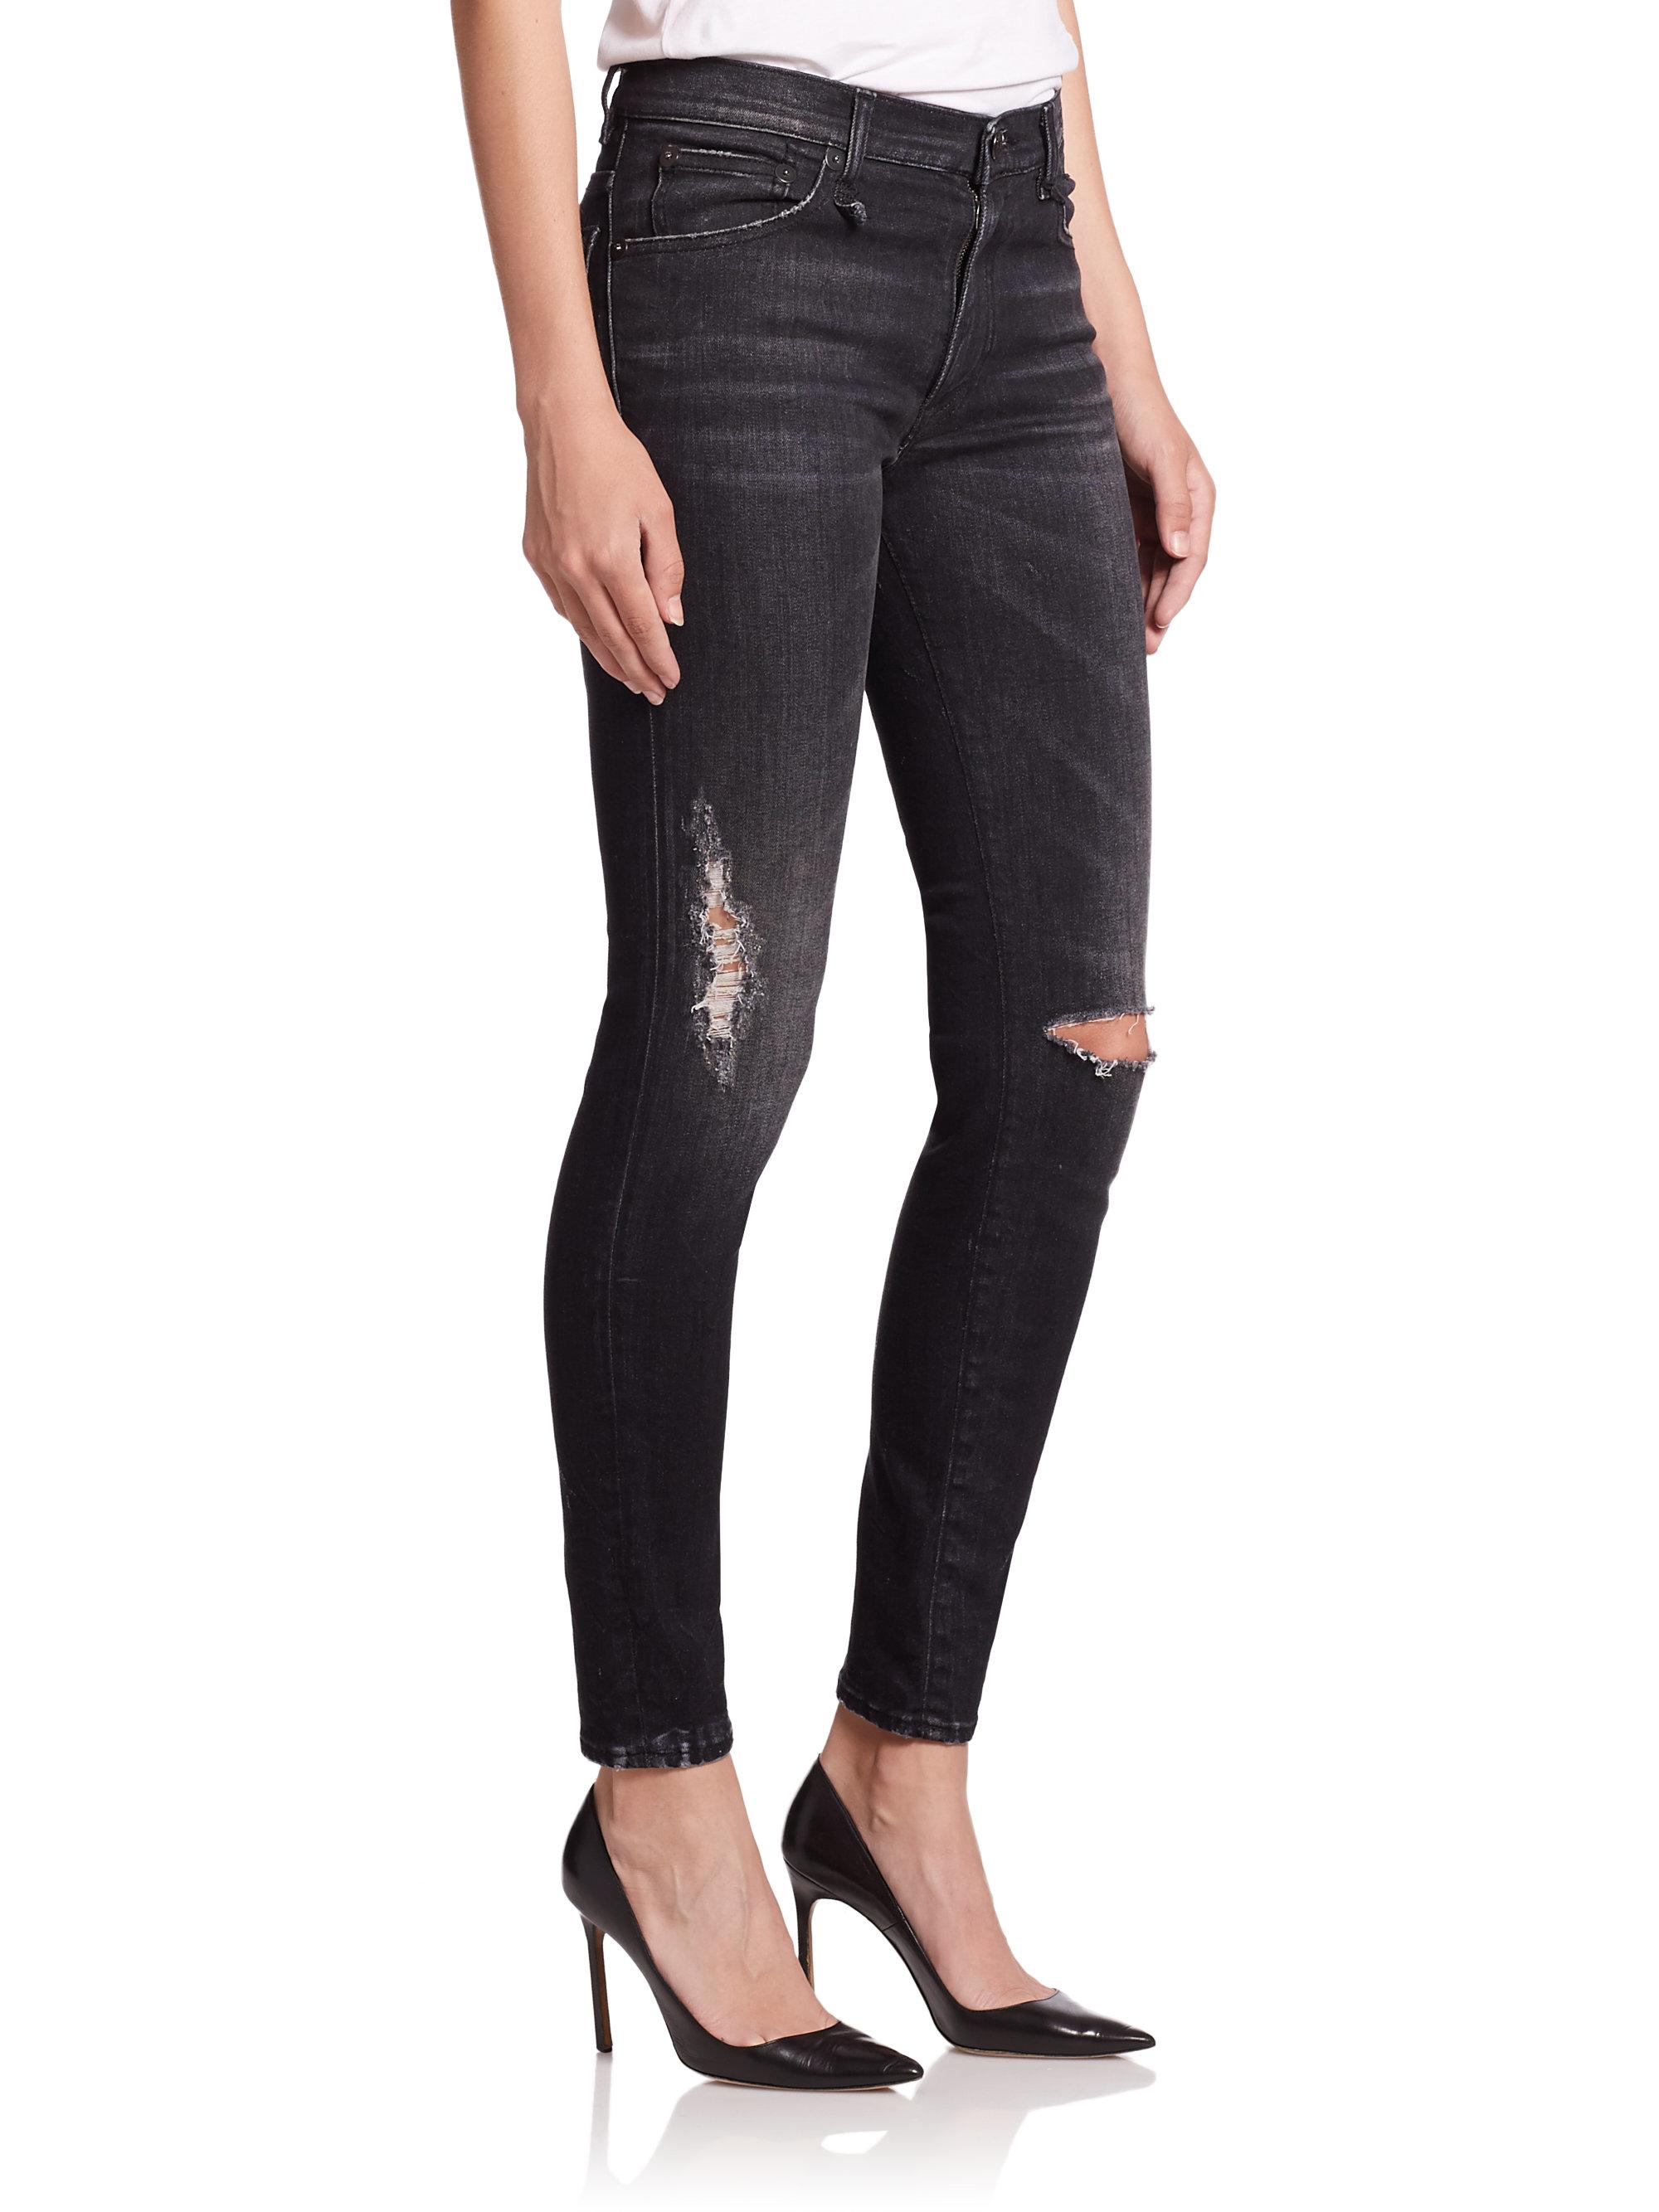 distressed detail jeans - Black R13 v7GIBlbZv